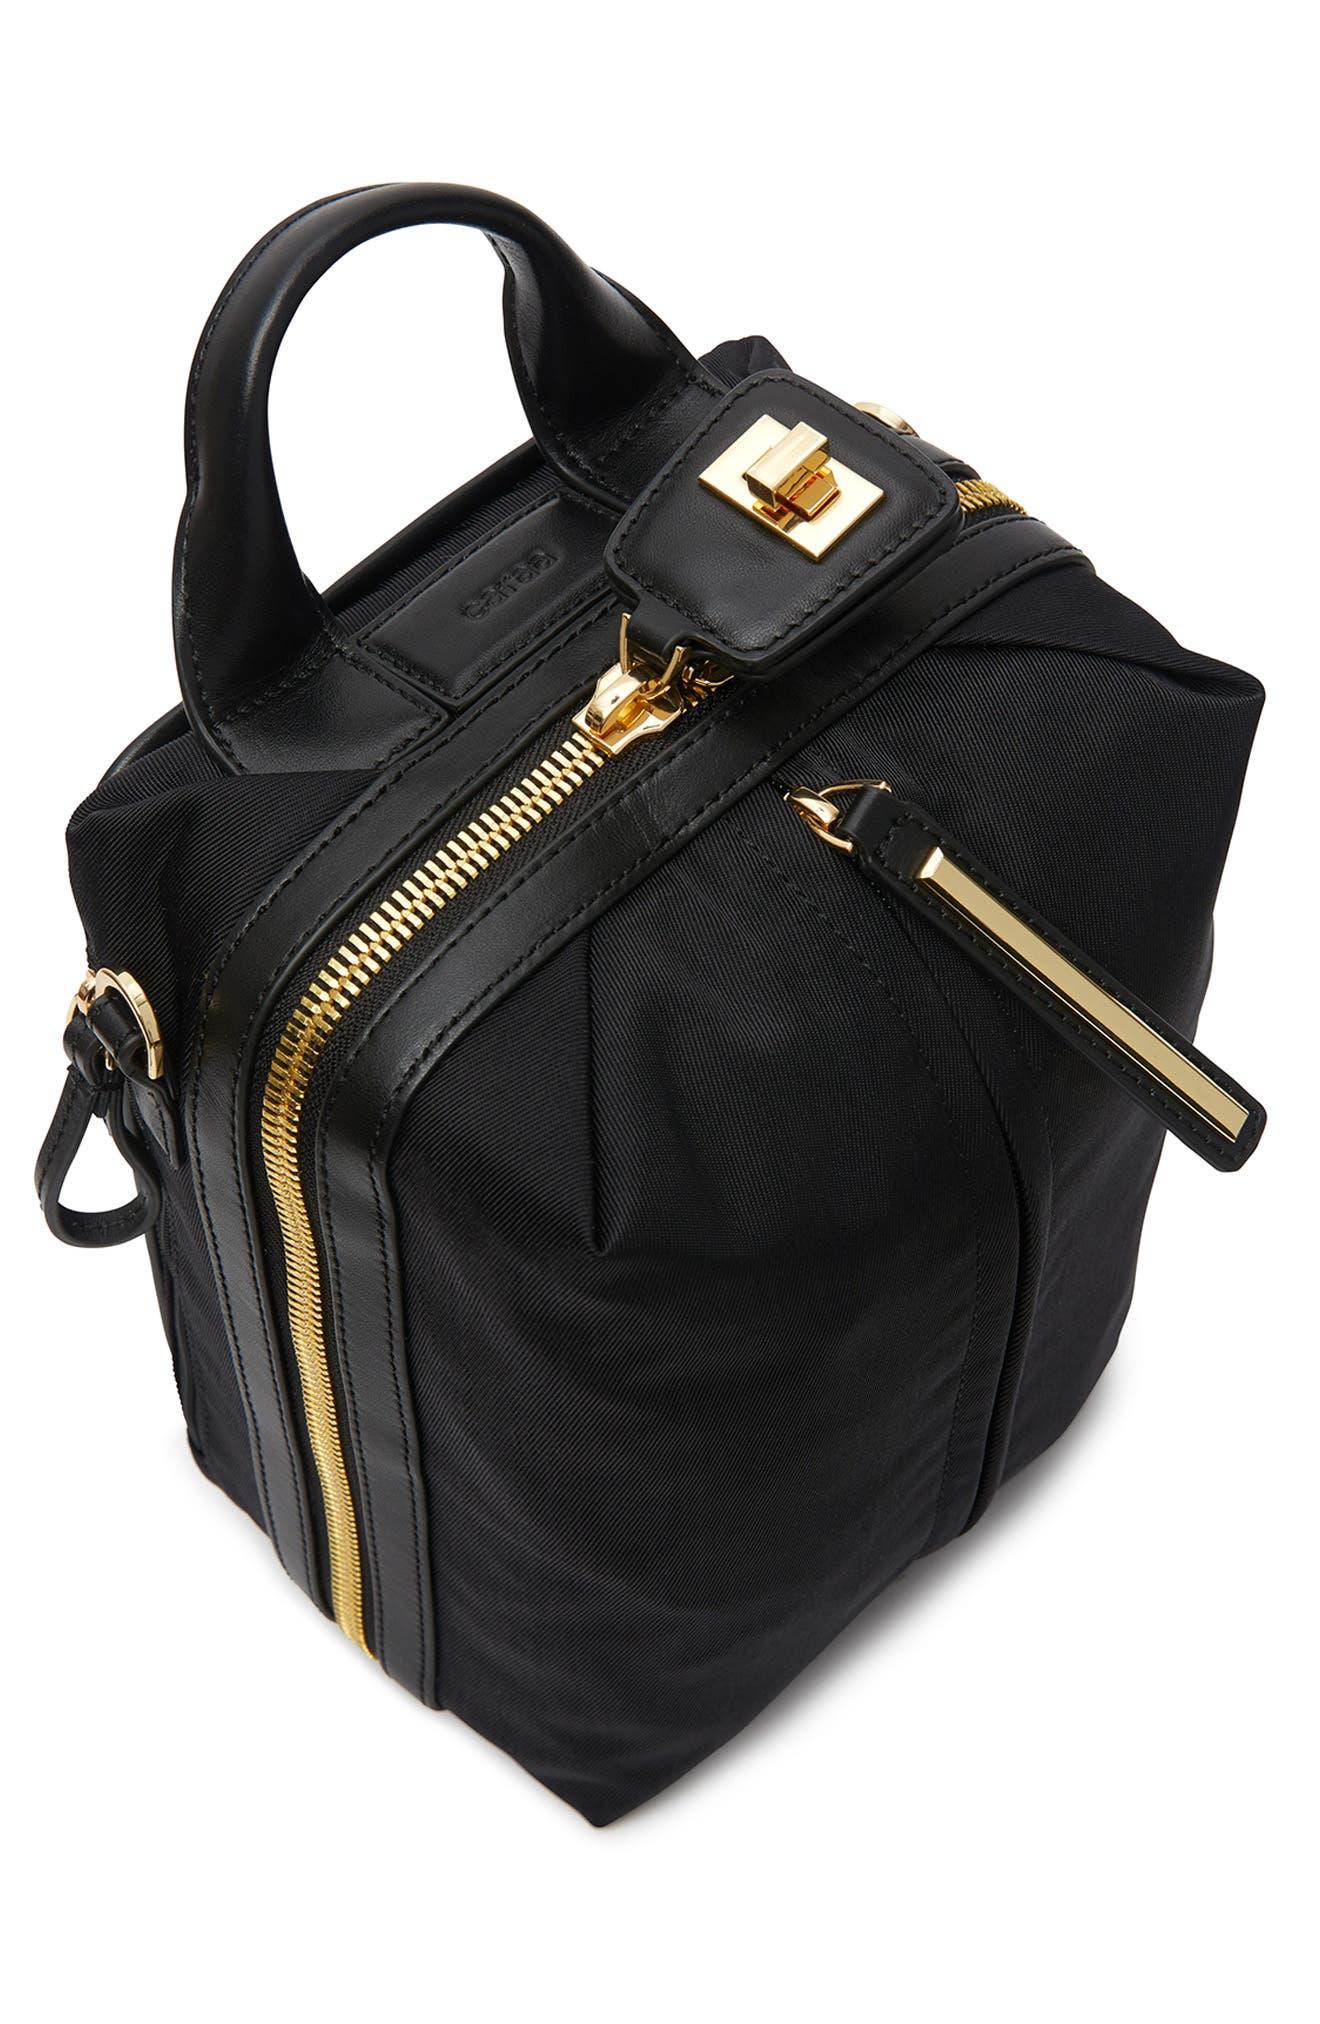 Studio 2 Mini Duffel Bag,                             Alternate thumbnail 6, color,                             BLACK GOLD